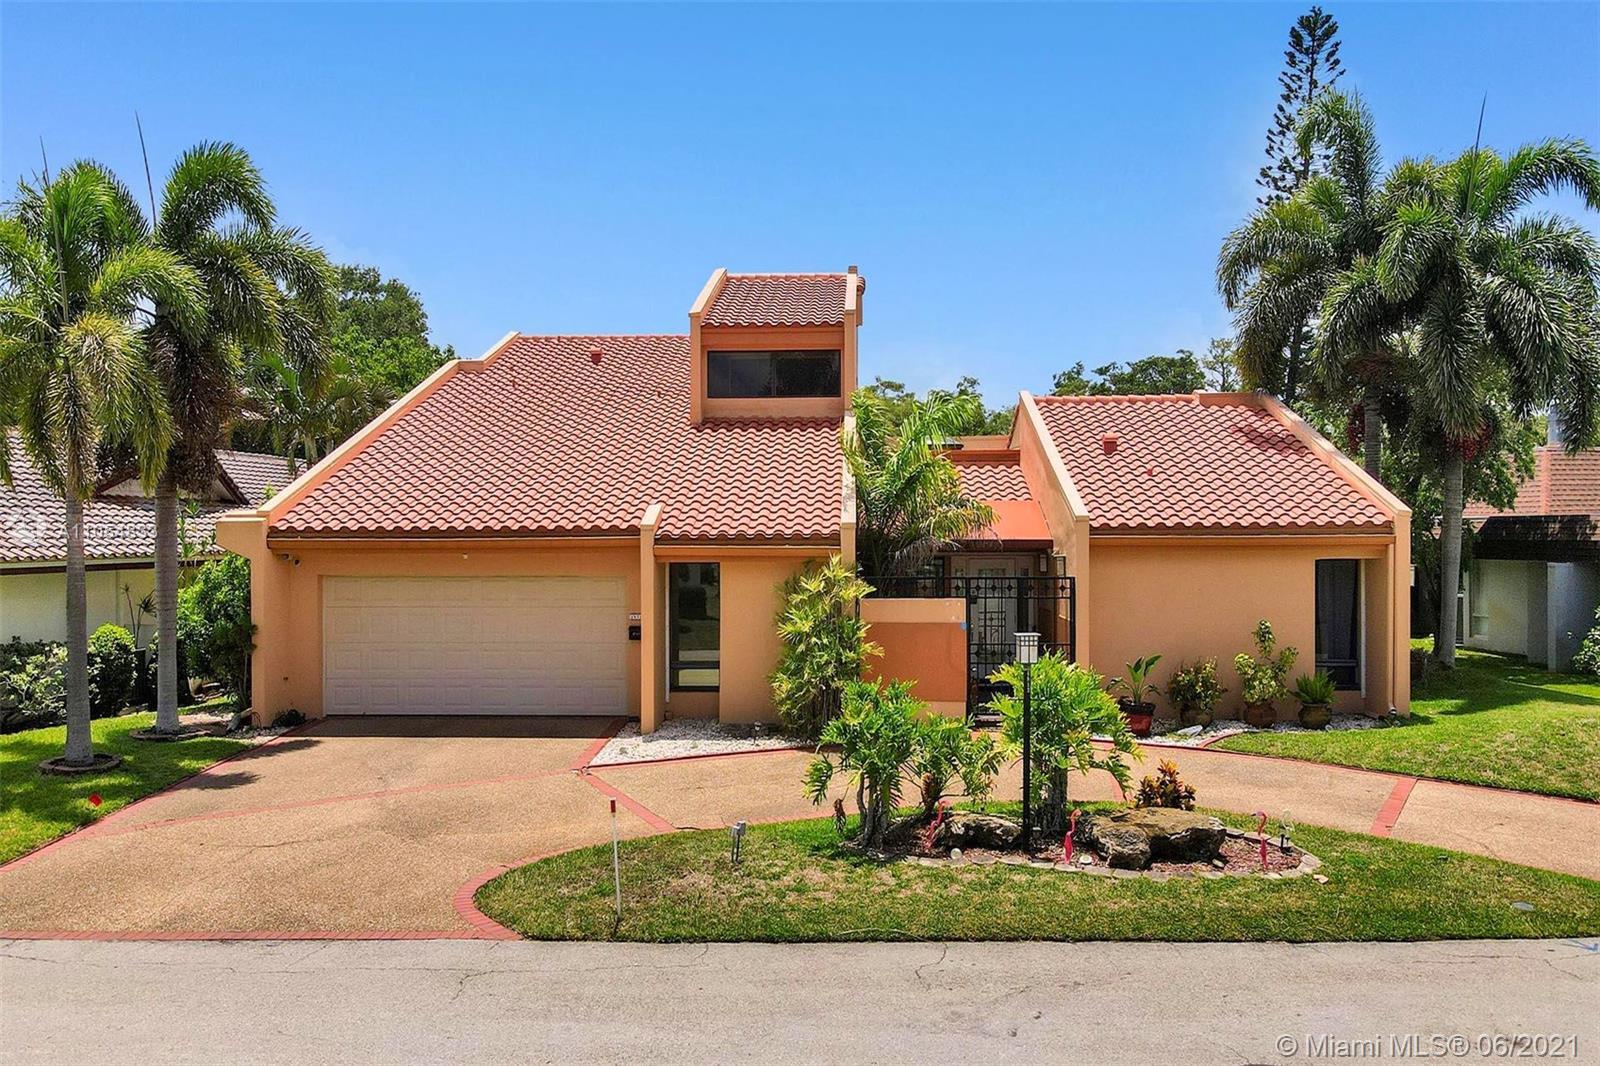 Property for sale at 4813 Banyan Ln, Tamarac,  Florida 33319